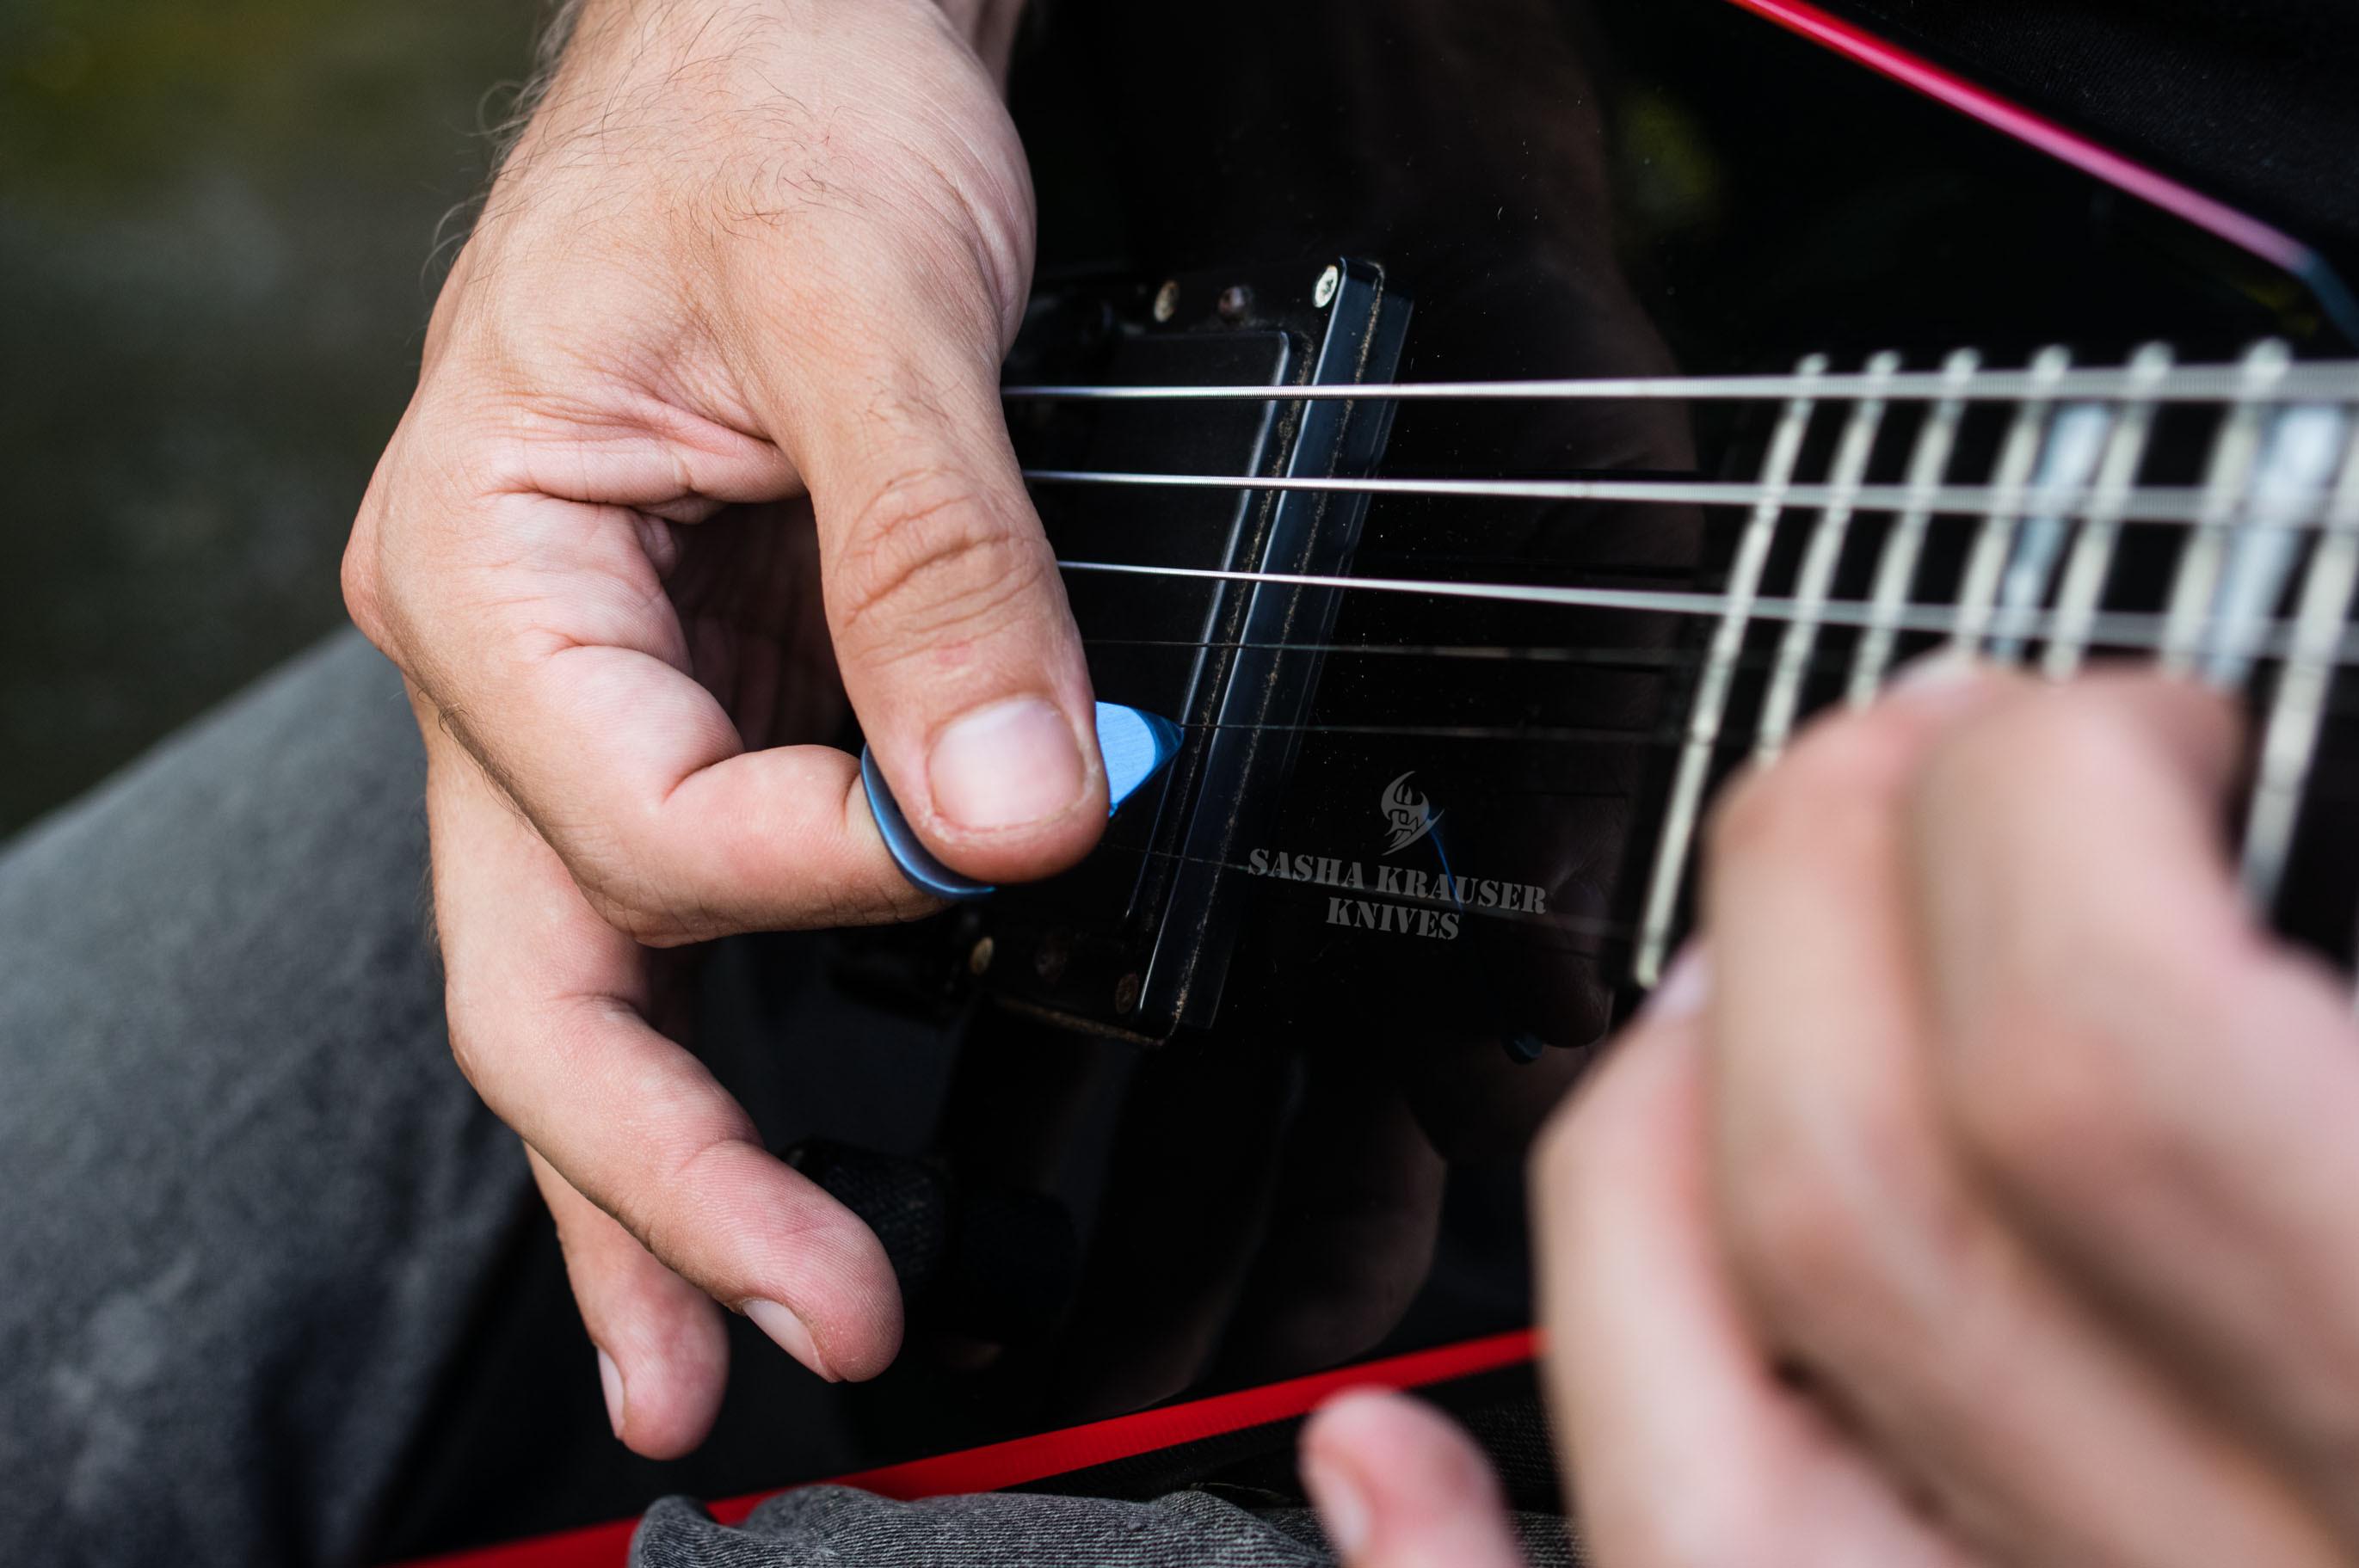 mediator guitare titane grade 5 anodizé bleu